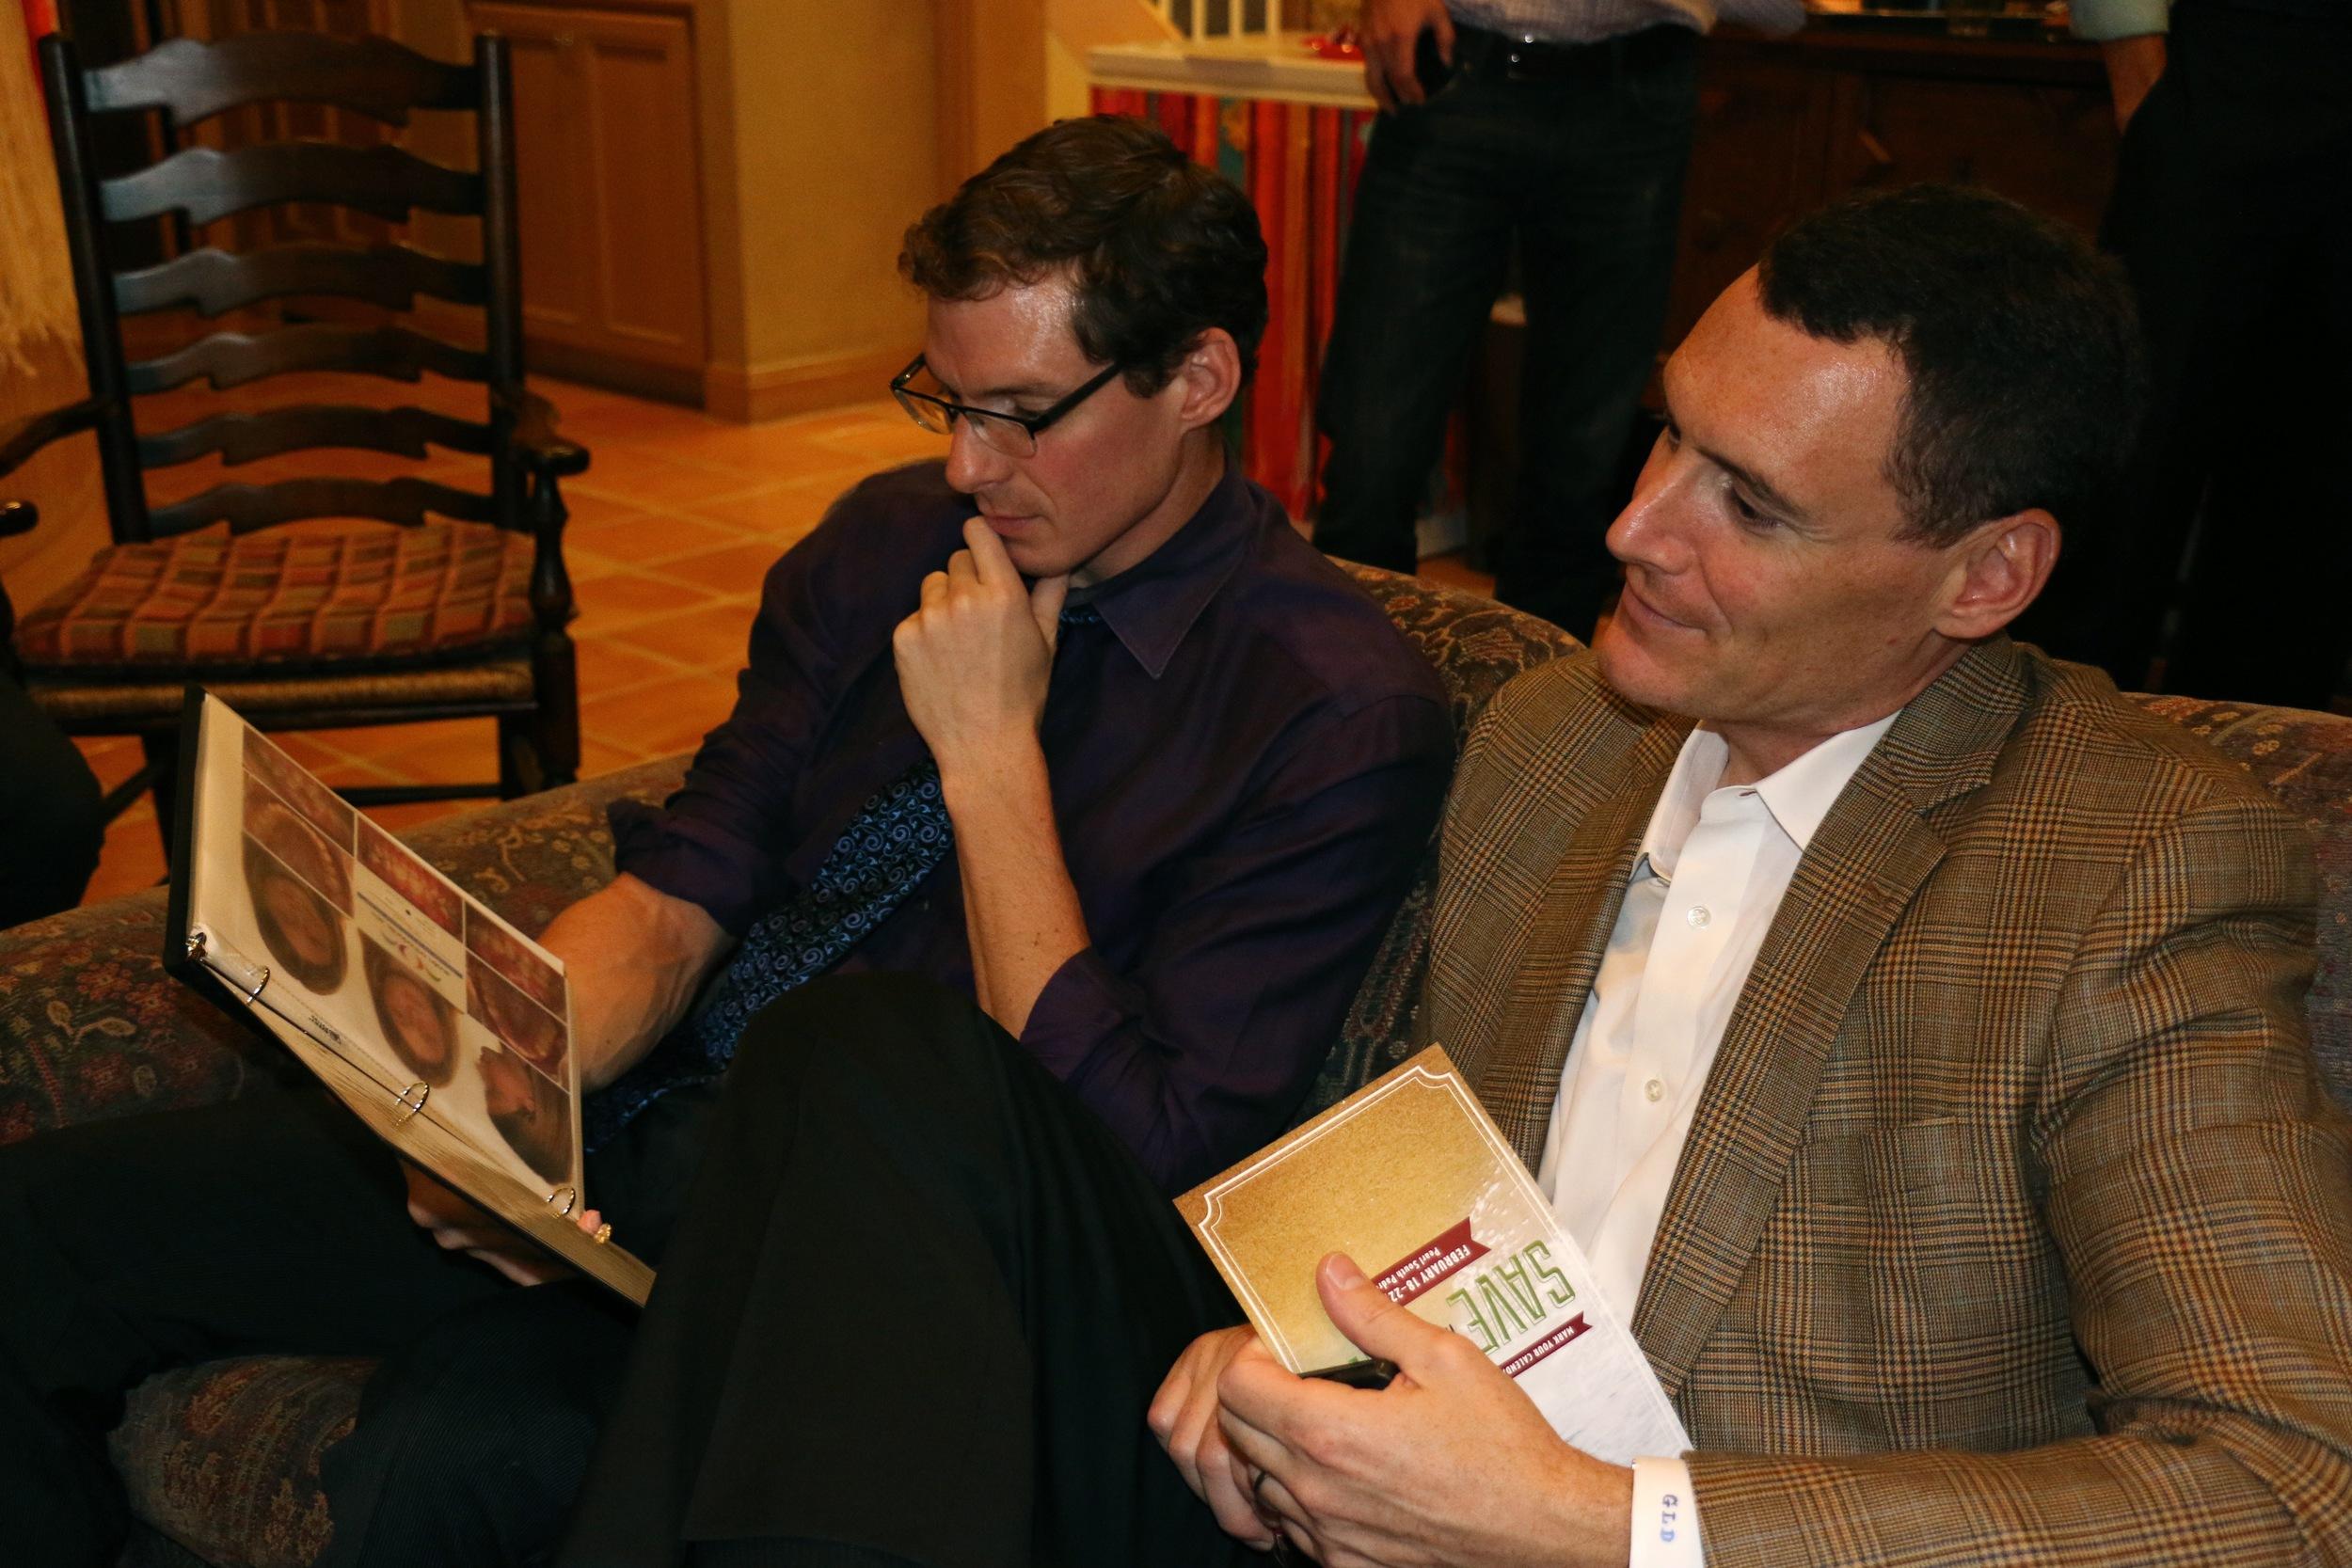 Drs. Jeff Dykes and Gerard DeSantis